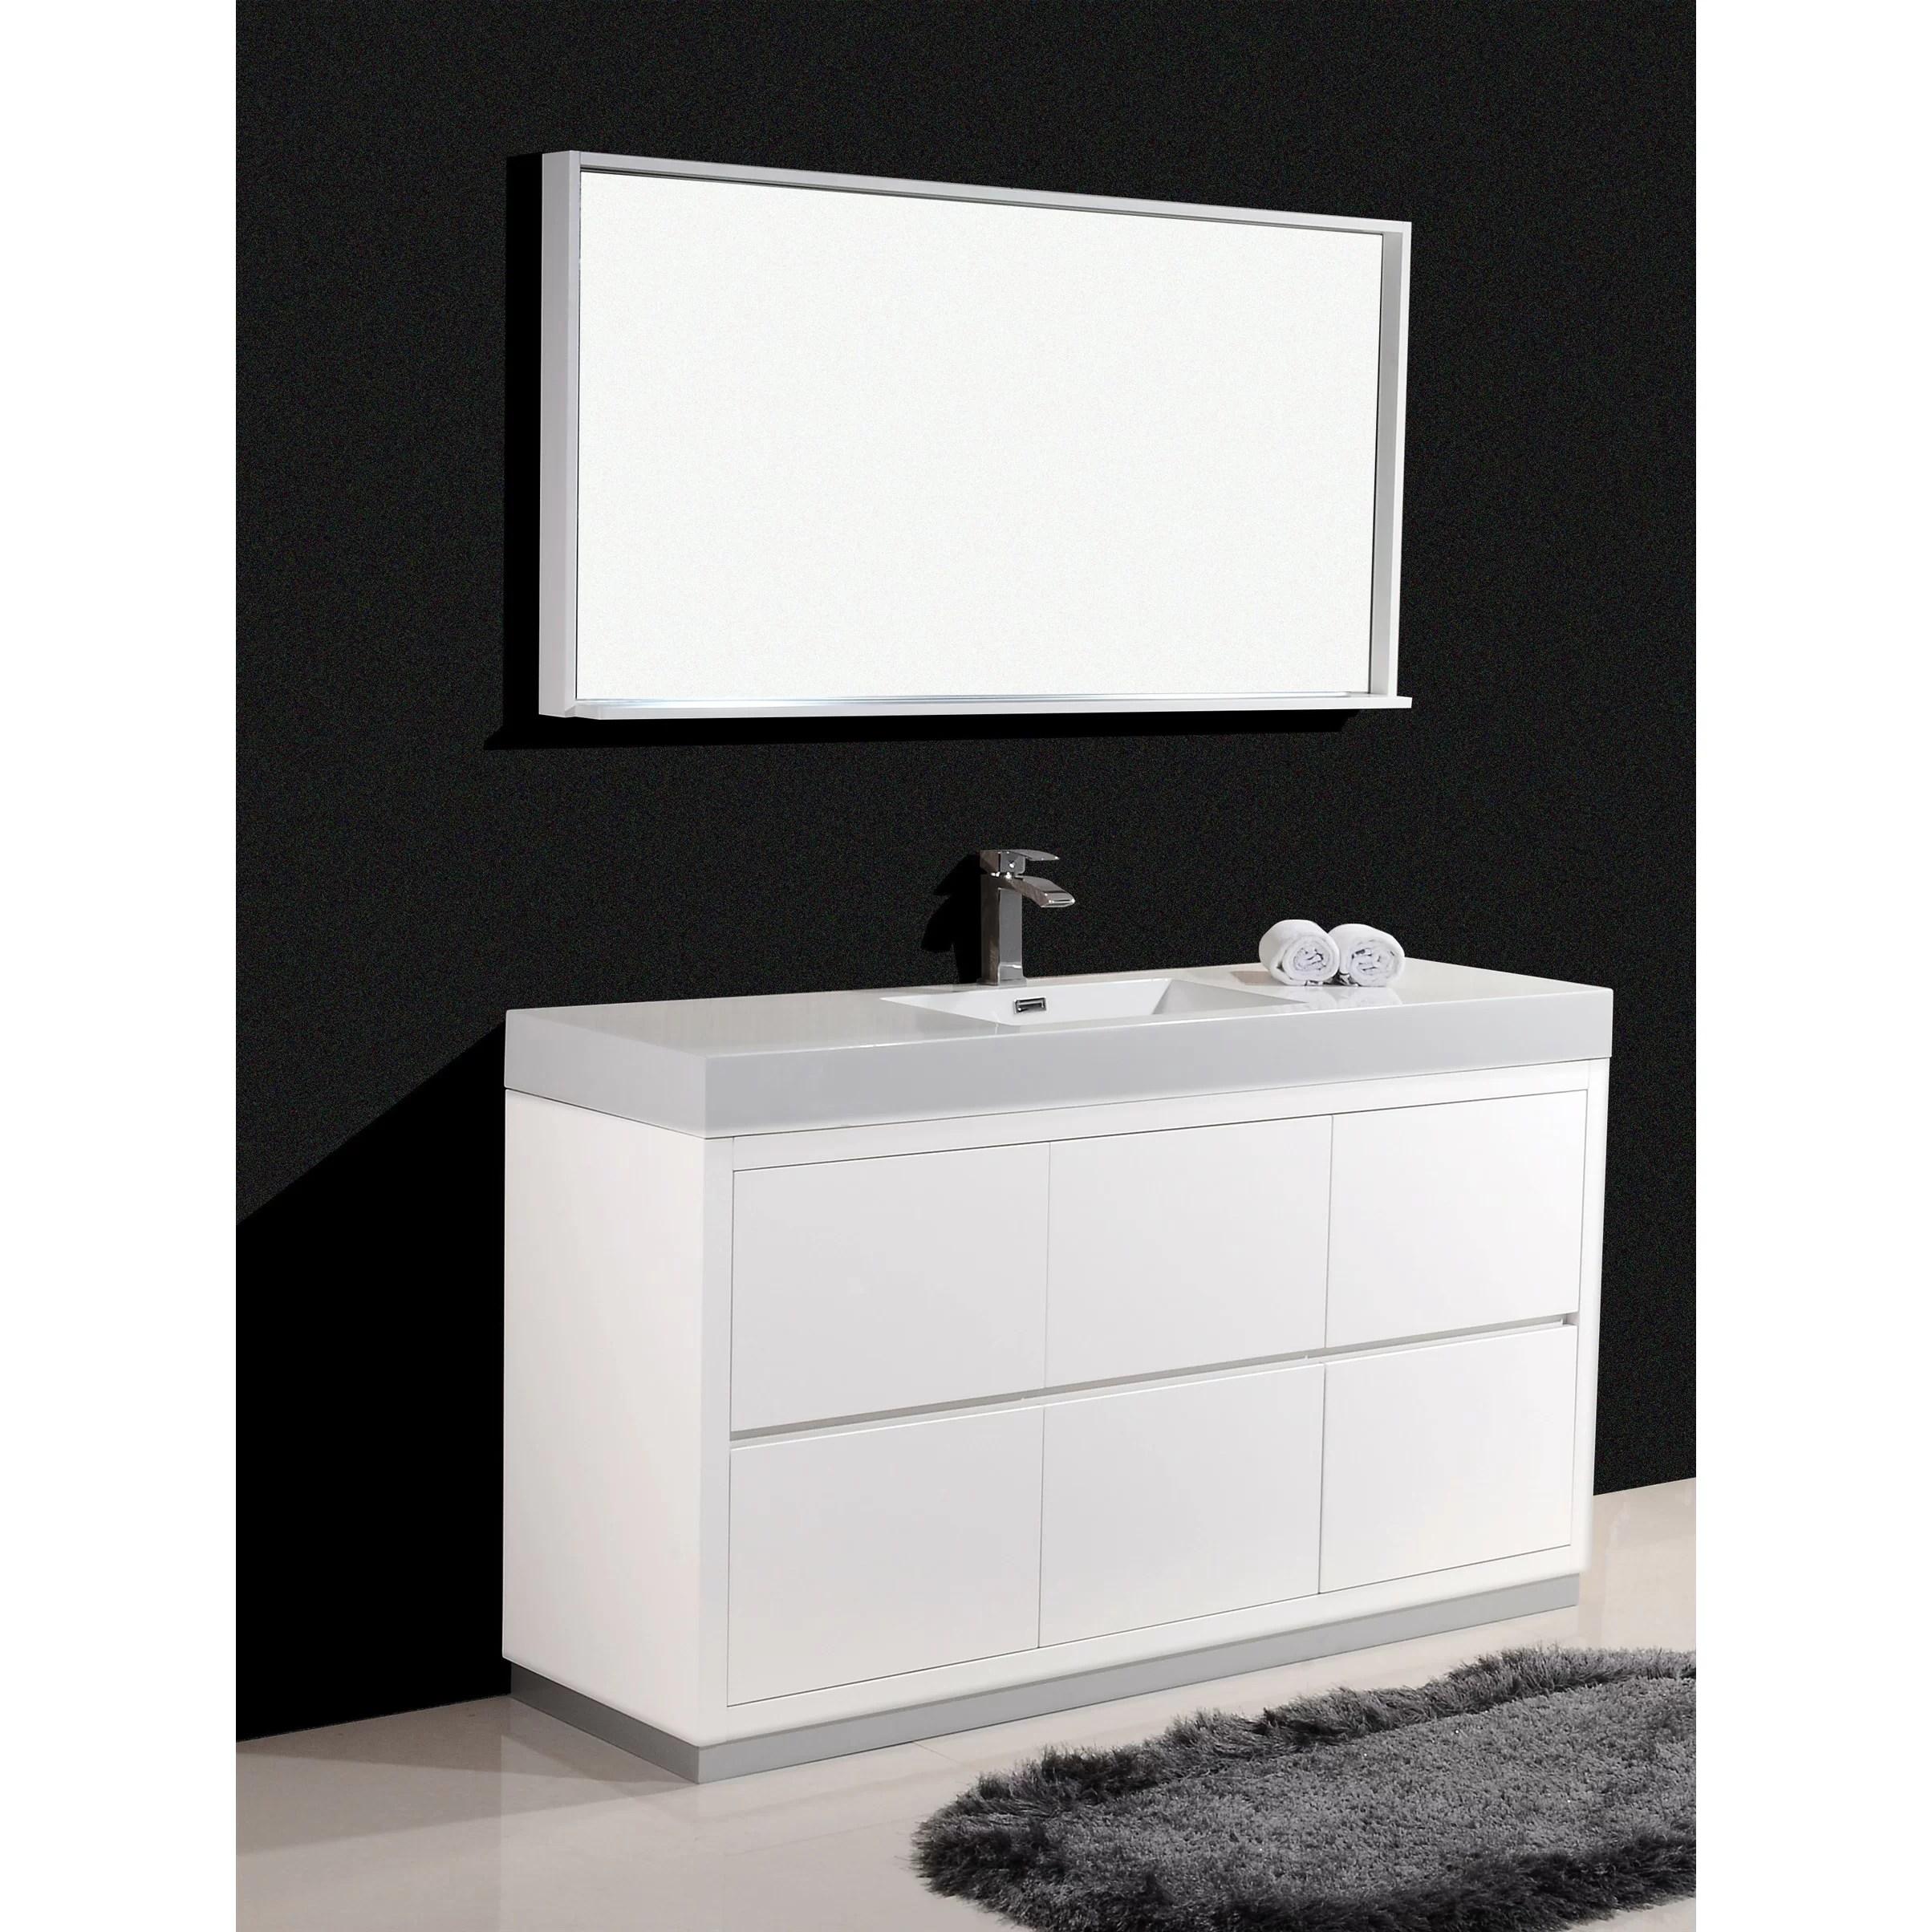 Kube Bath Bliss 60 Single Free Standing Modern Bathroom